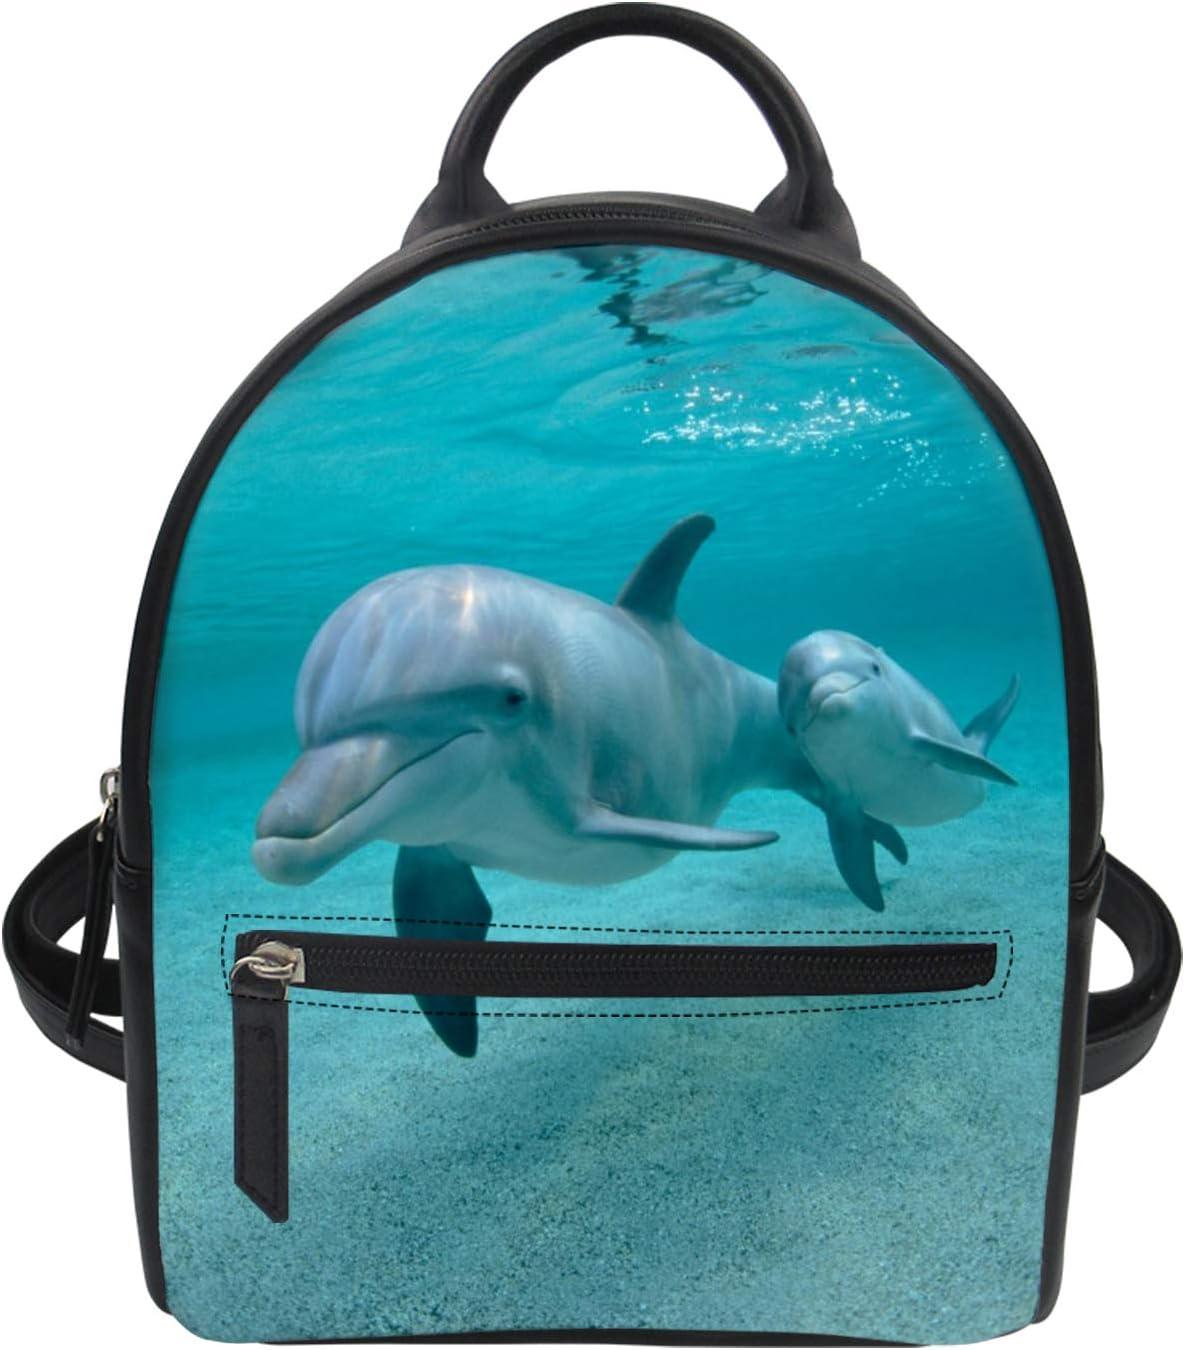 PZZ BEACH Anti-Scratch Fees free PU Leather Wom Backpack for Shoulder Mini Sale price